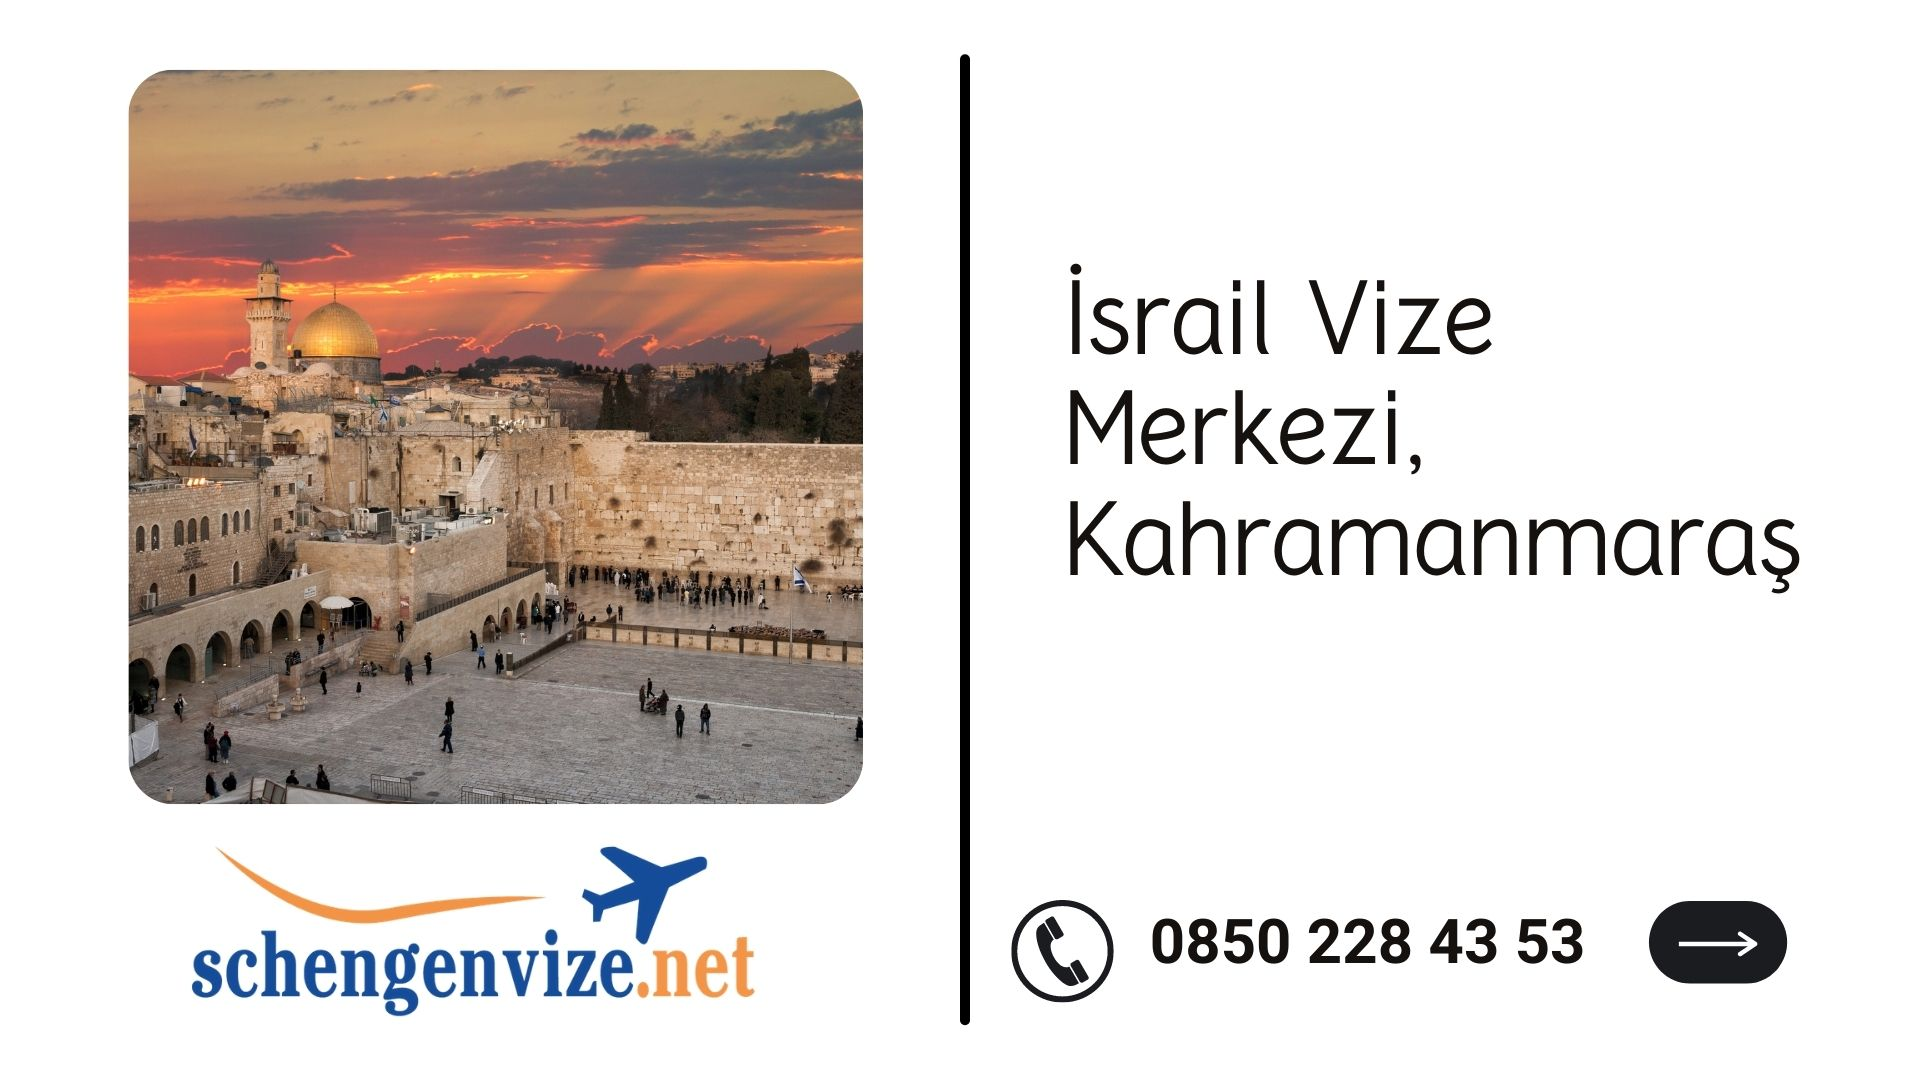 İsrail Vize Merkezi, Kahramanmaraş